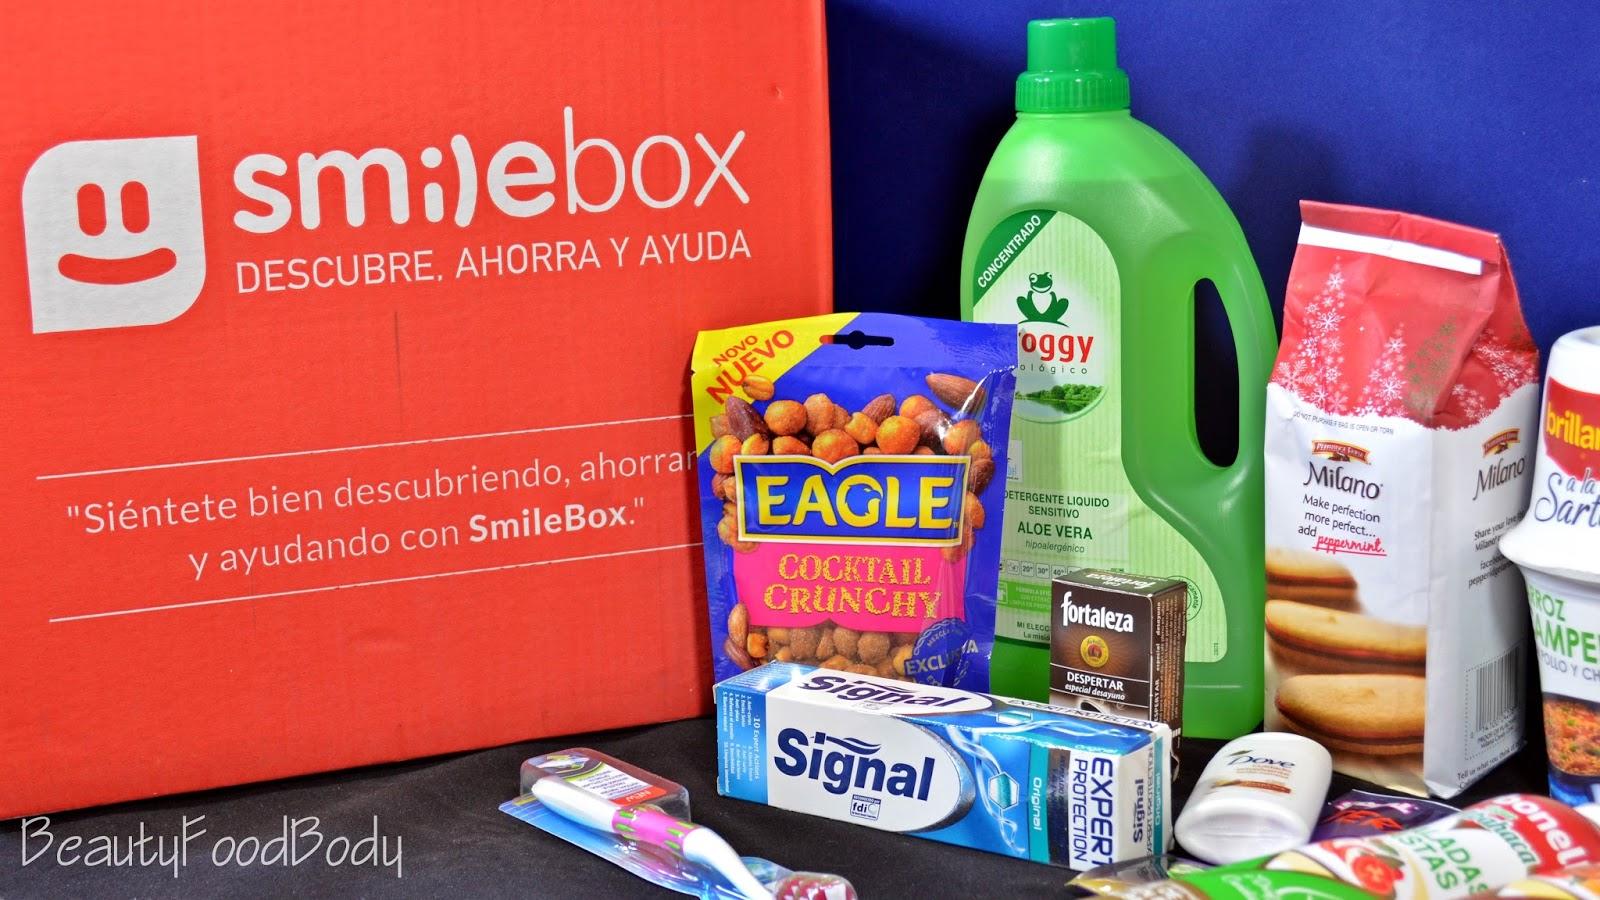 review opinion reseña smilebox all star caja mensual diciembre 2014 febrero 2015 beautyfoodbody